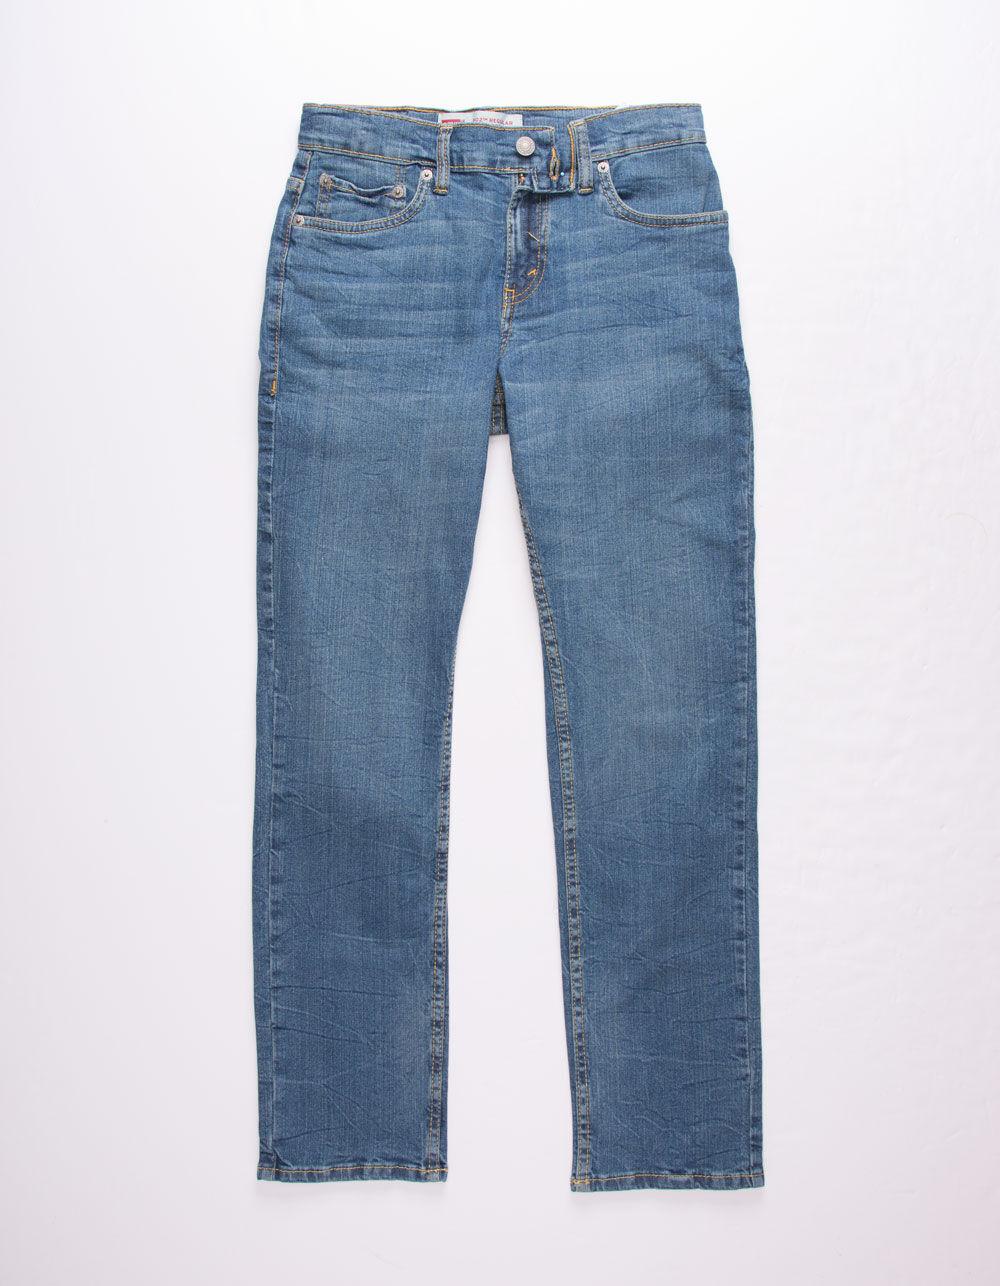 LEVI'S 502 Regular Taper Fit Dark Denim Boys Jeans